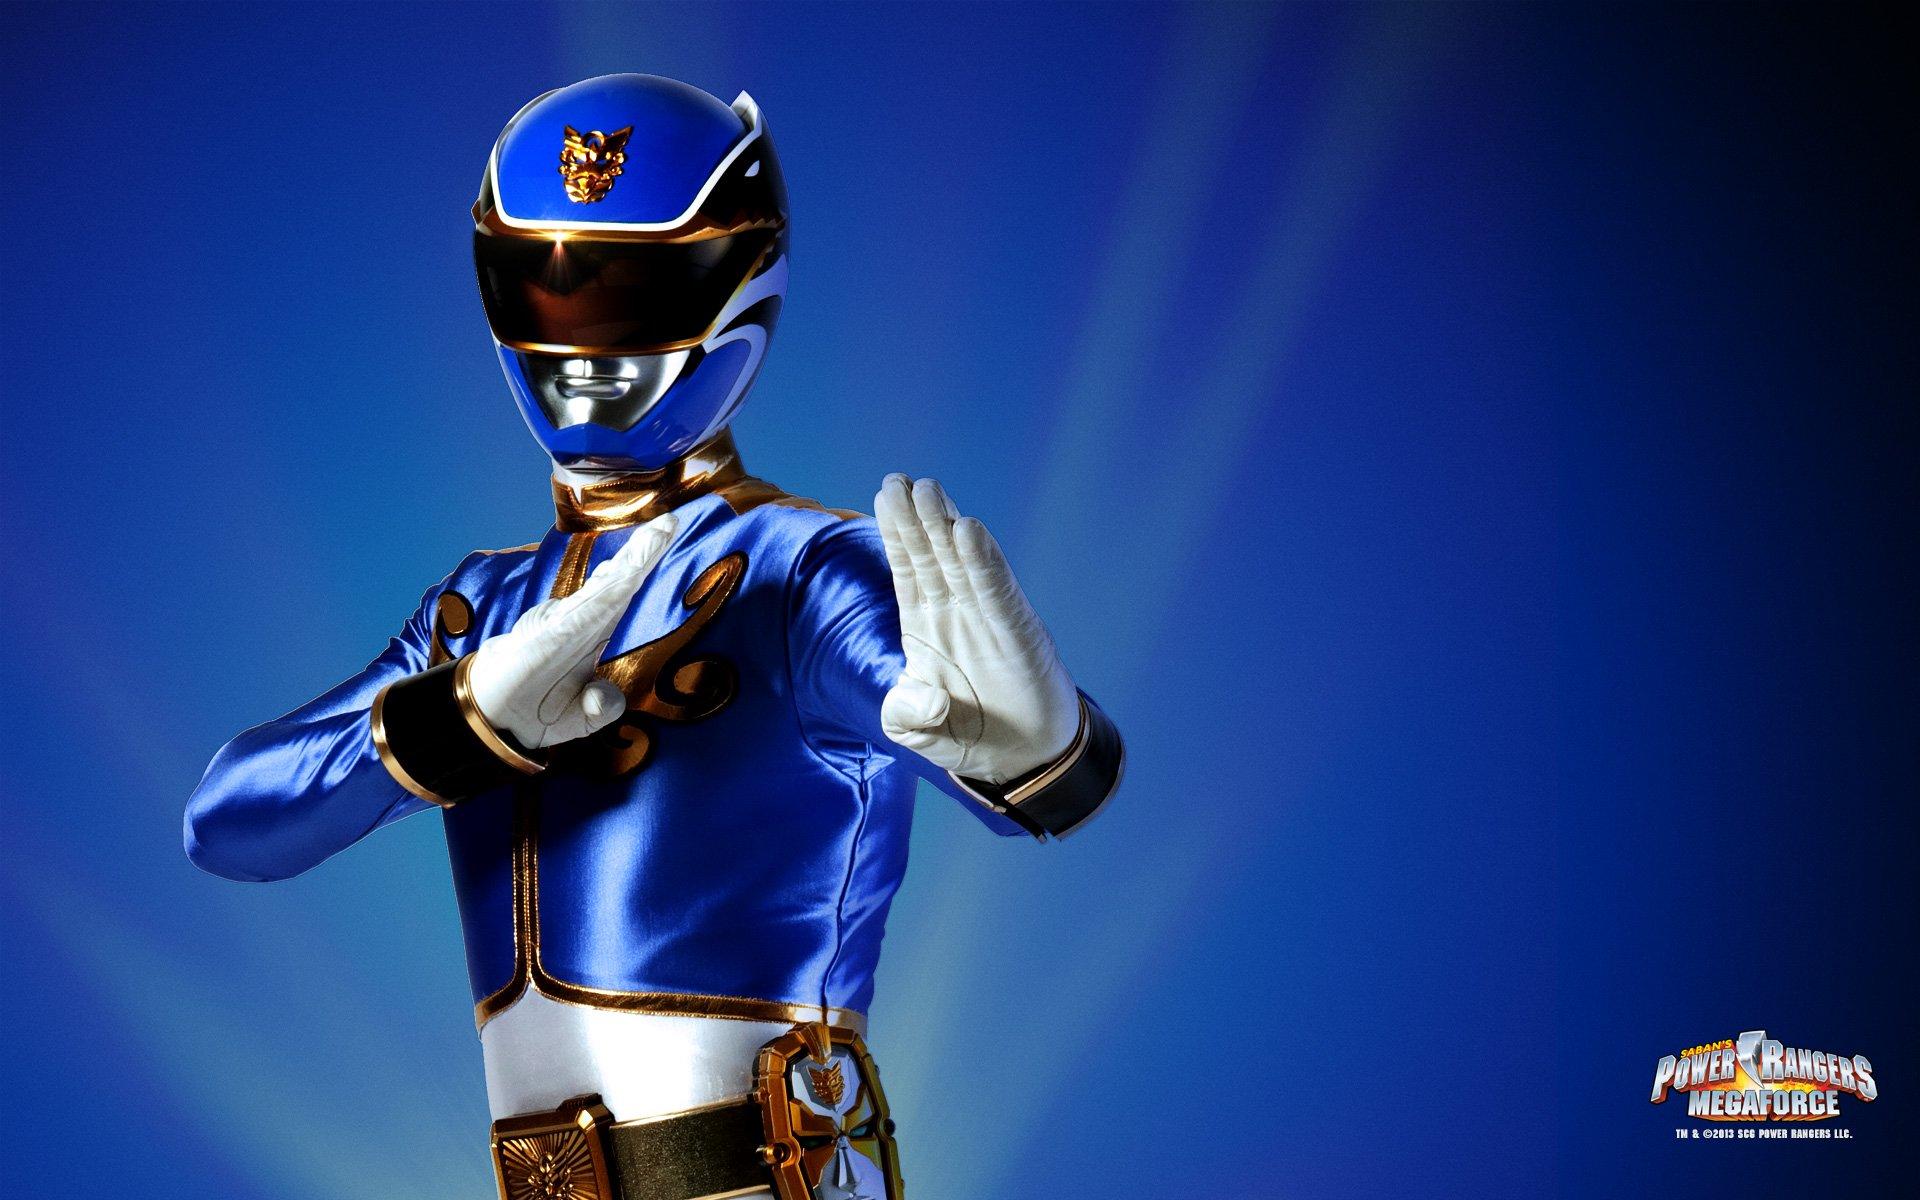 Blue Power Ranger Wallpaper - WallpaperSafari